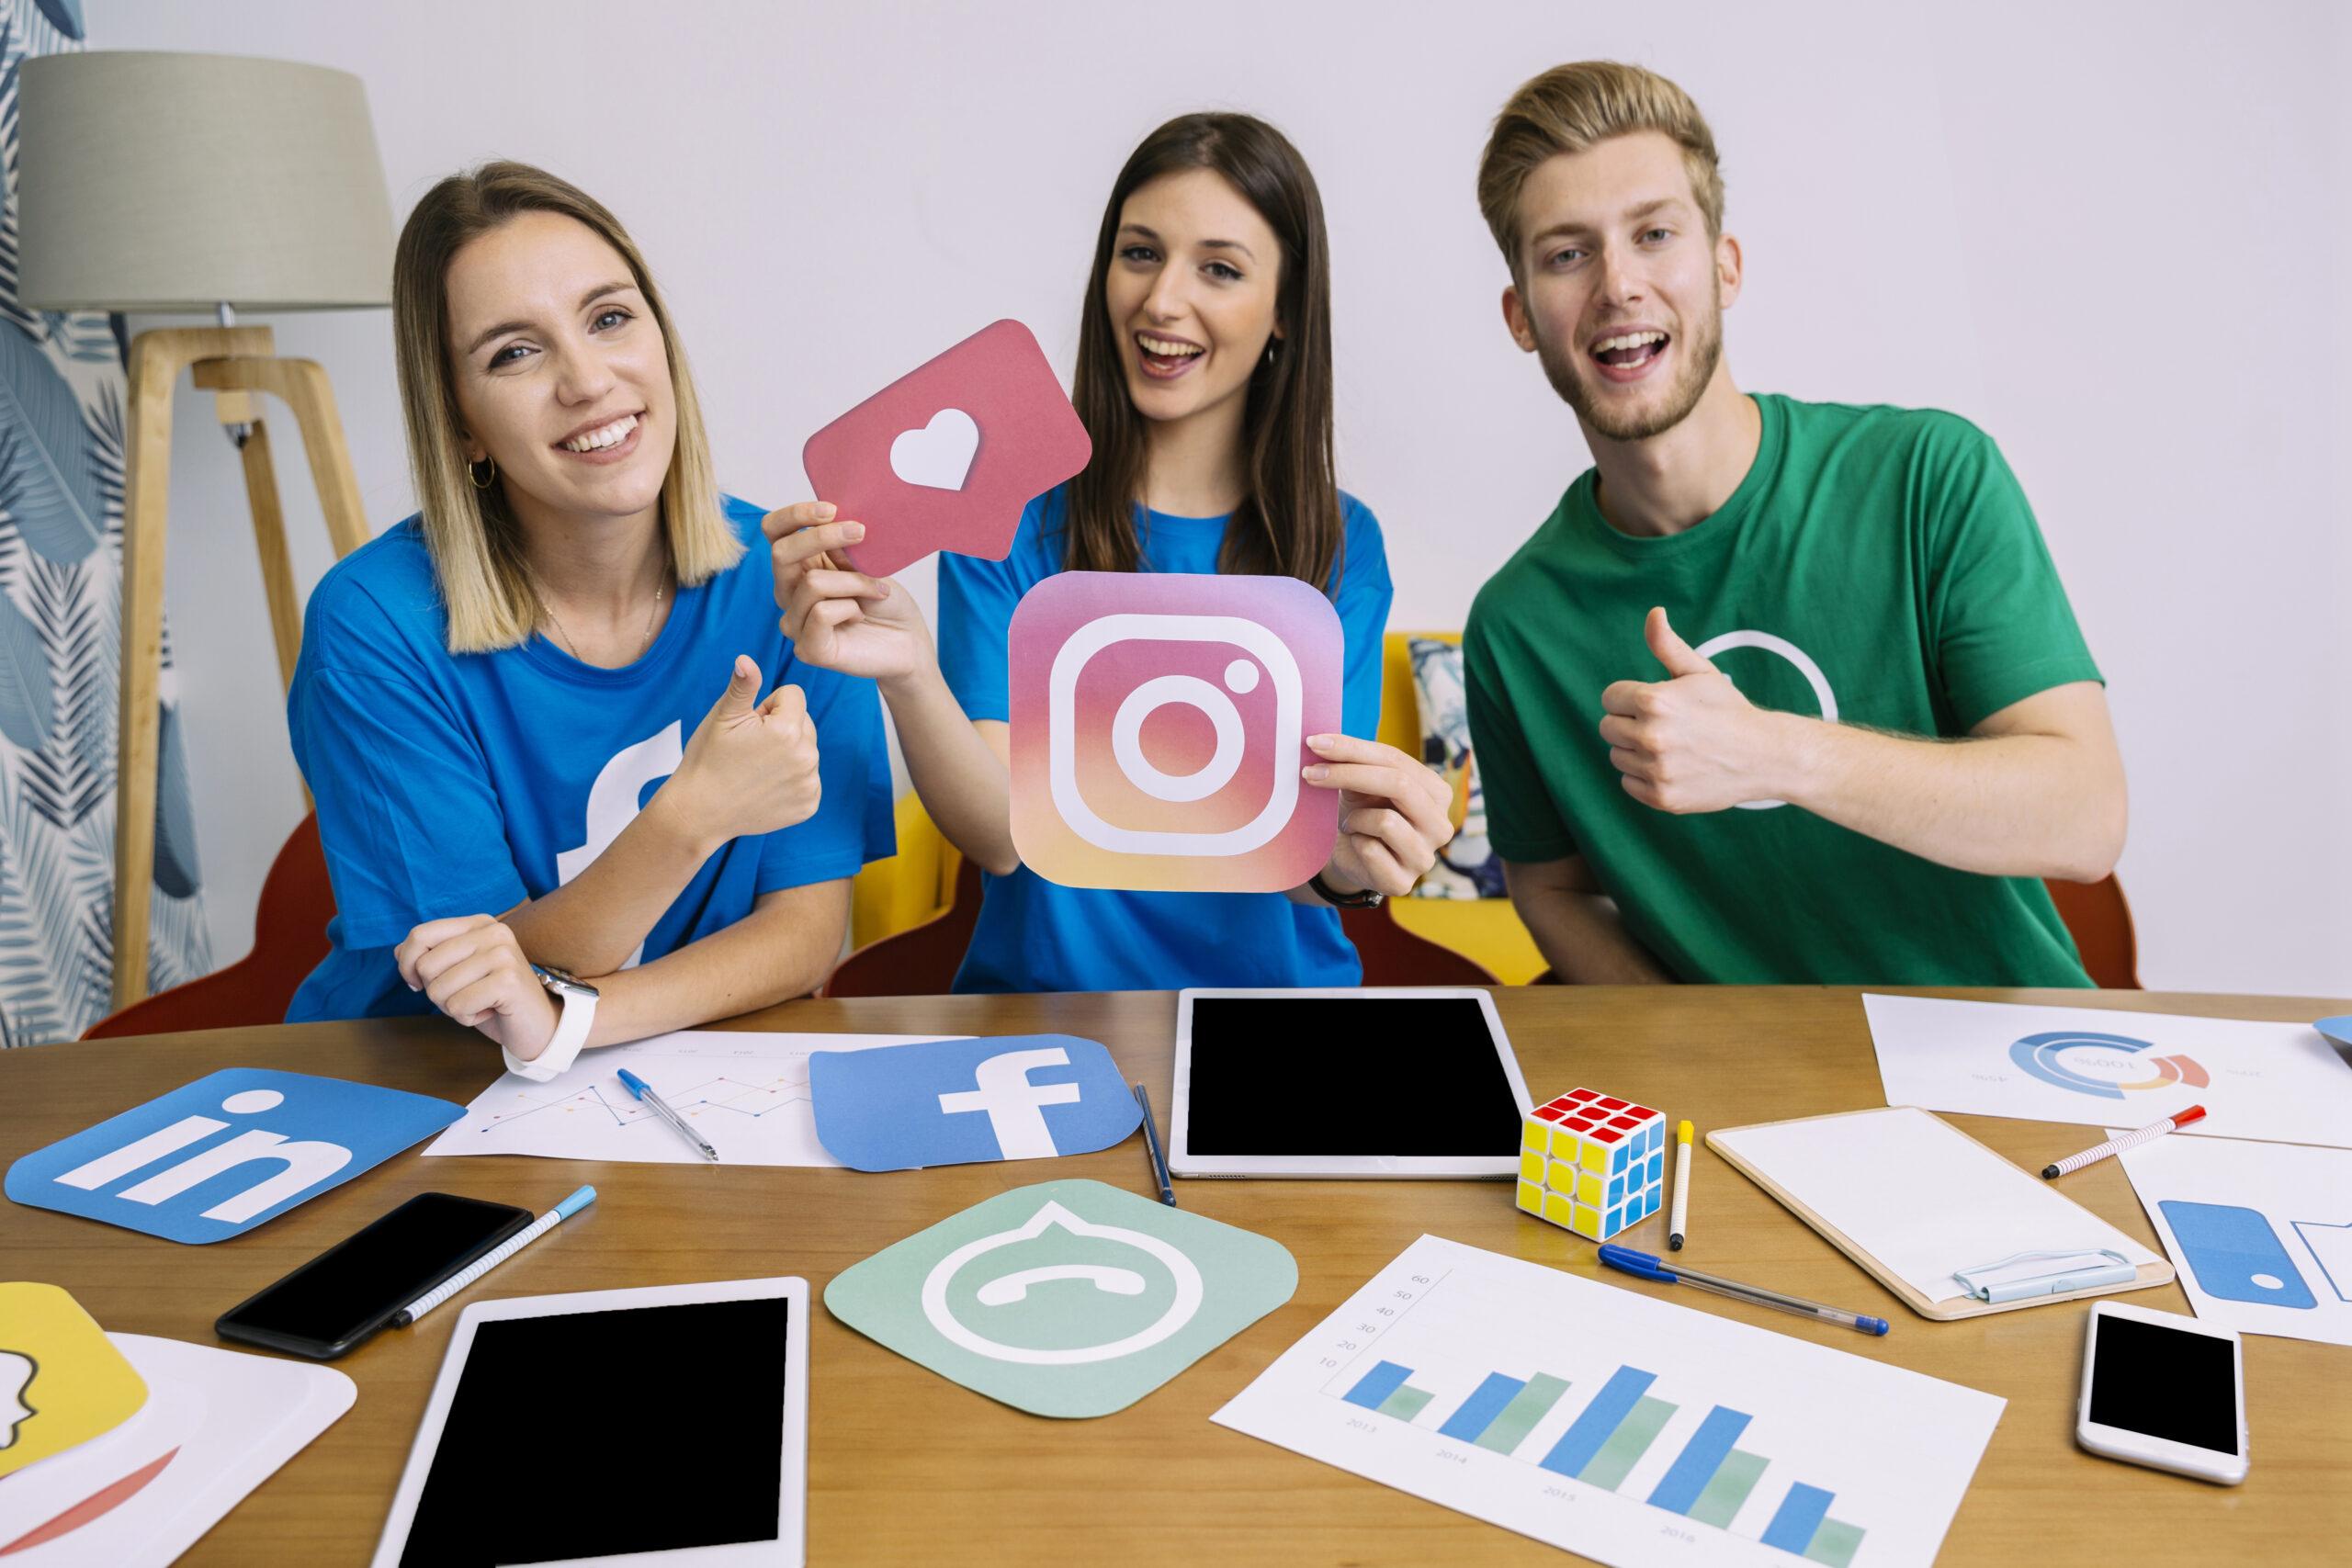 Facebook planeja integrar ferramentas para troca de mensagens